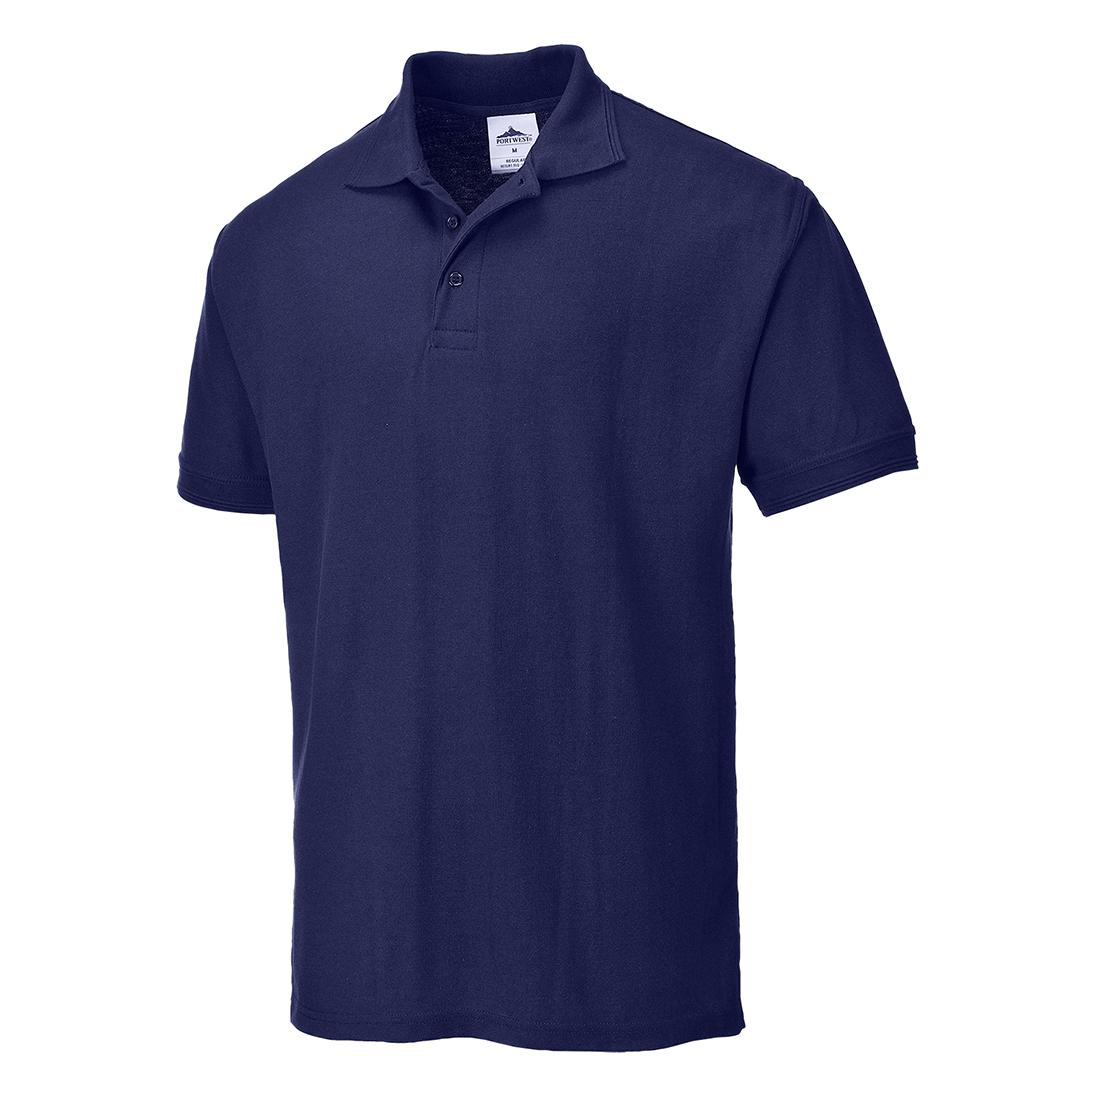 Portwest B210 Naples Mens Work Polo Shirt Polycotton Uniform Corporate Workwear